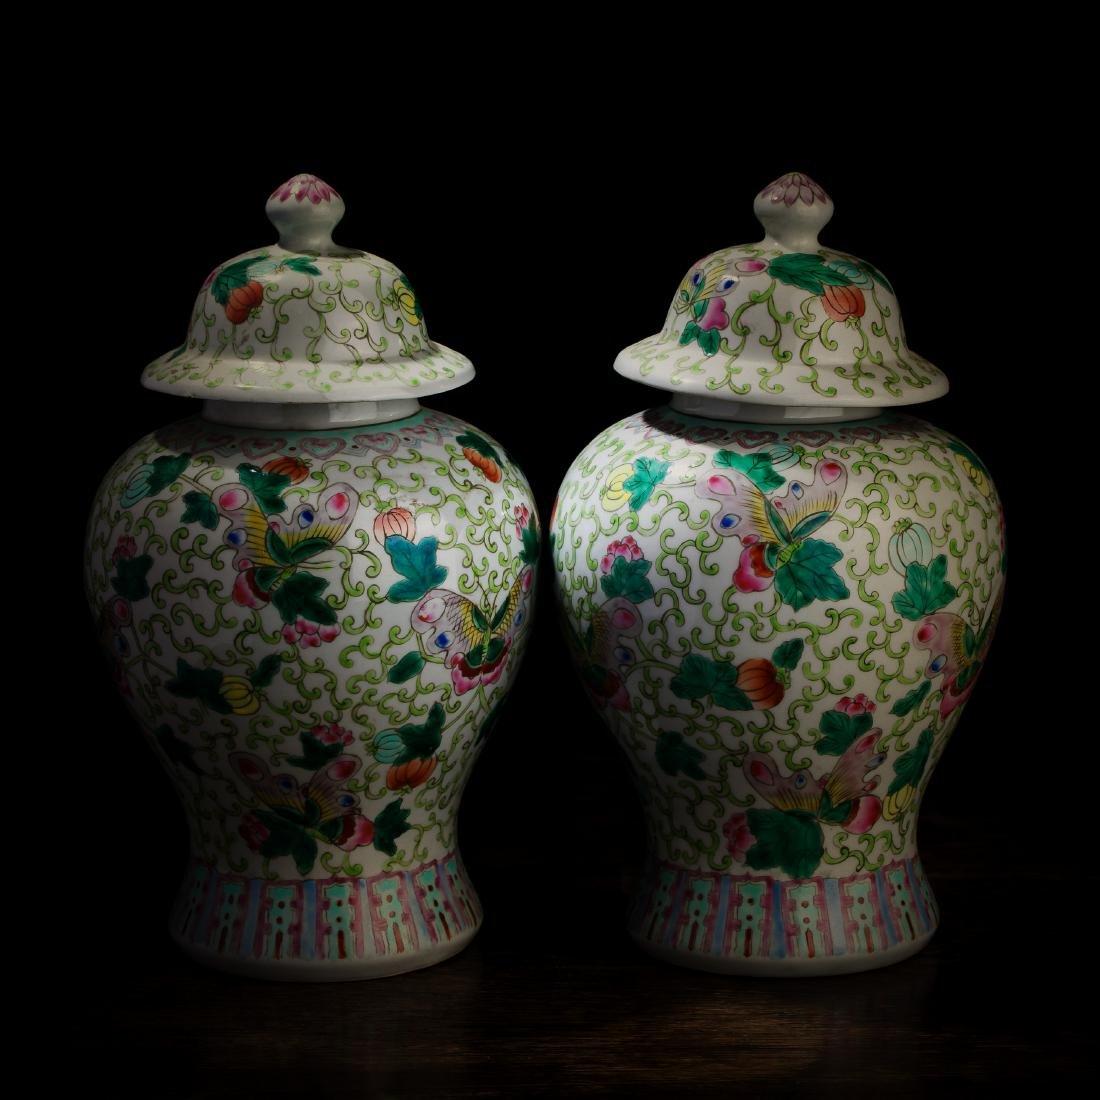 Qing Dynasty Kangxi Period Porcelain General Tank